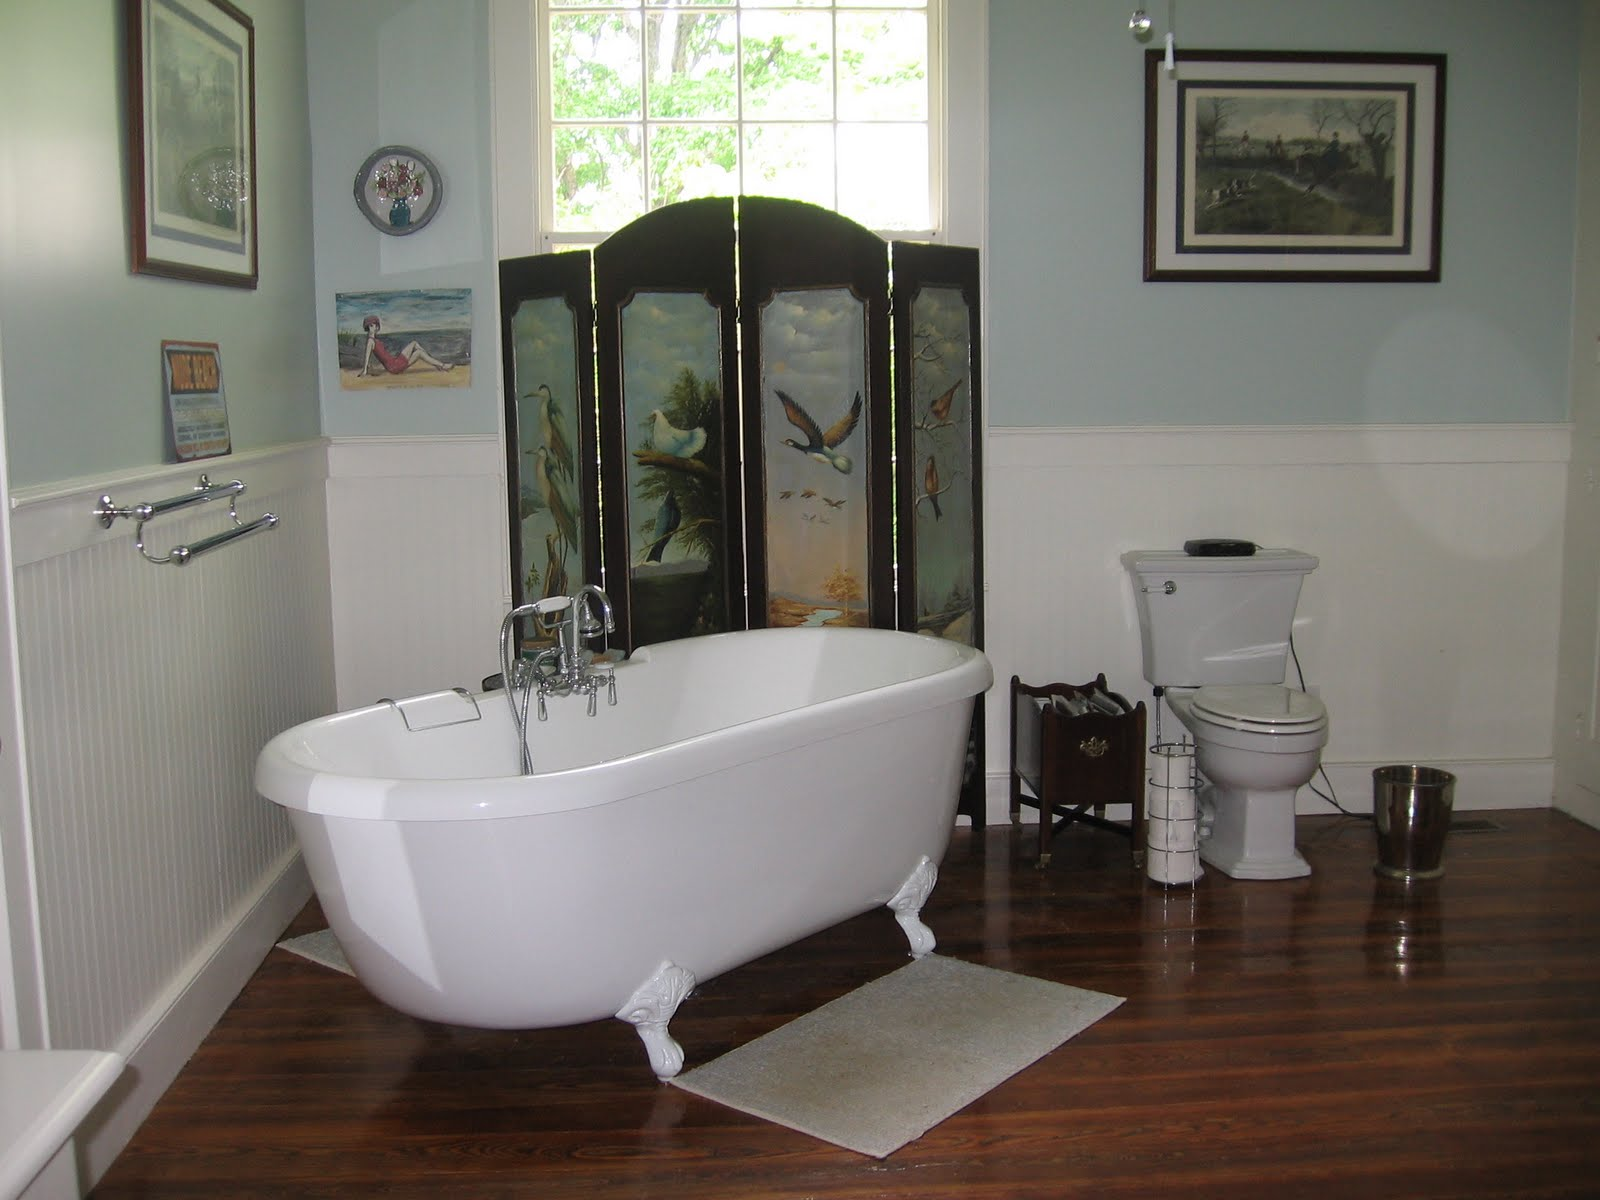 http://1.bp.blogspot.com/_rEv2IdnGjkg/S-y2W_Bz2JI/AAAAAAAAAXQ/7ZsxdzPNyX0/s1600/LFF+Bathroom+Finish+May+2010+001.jpg